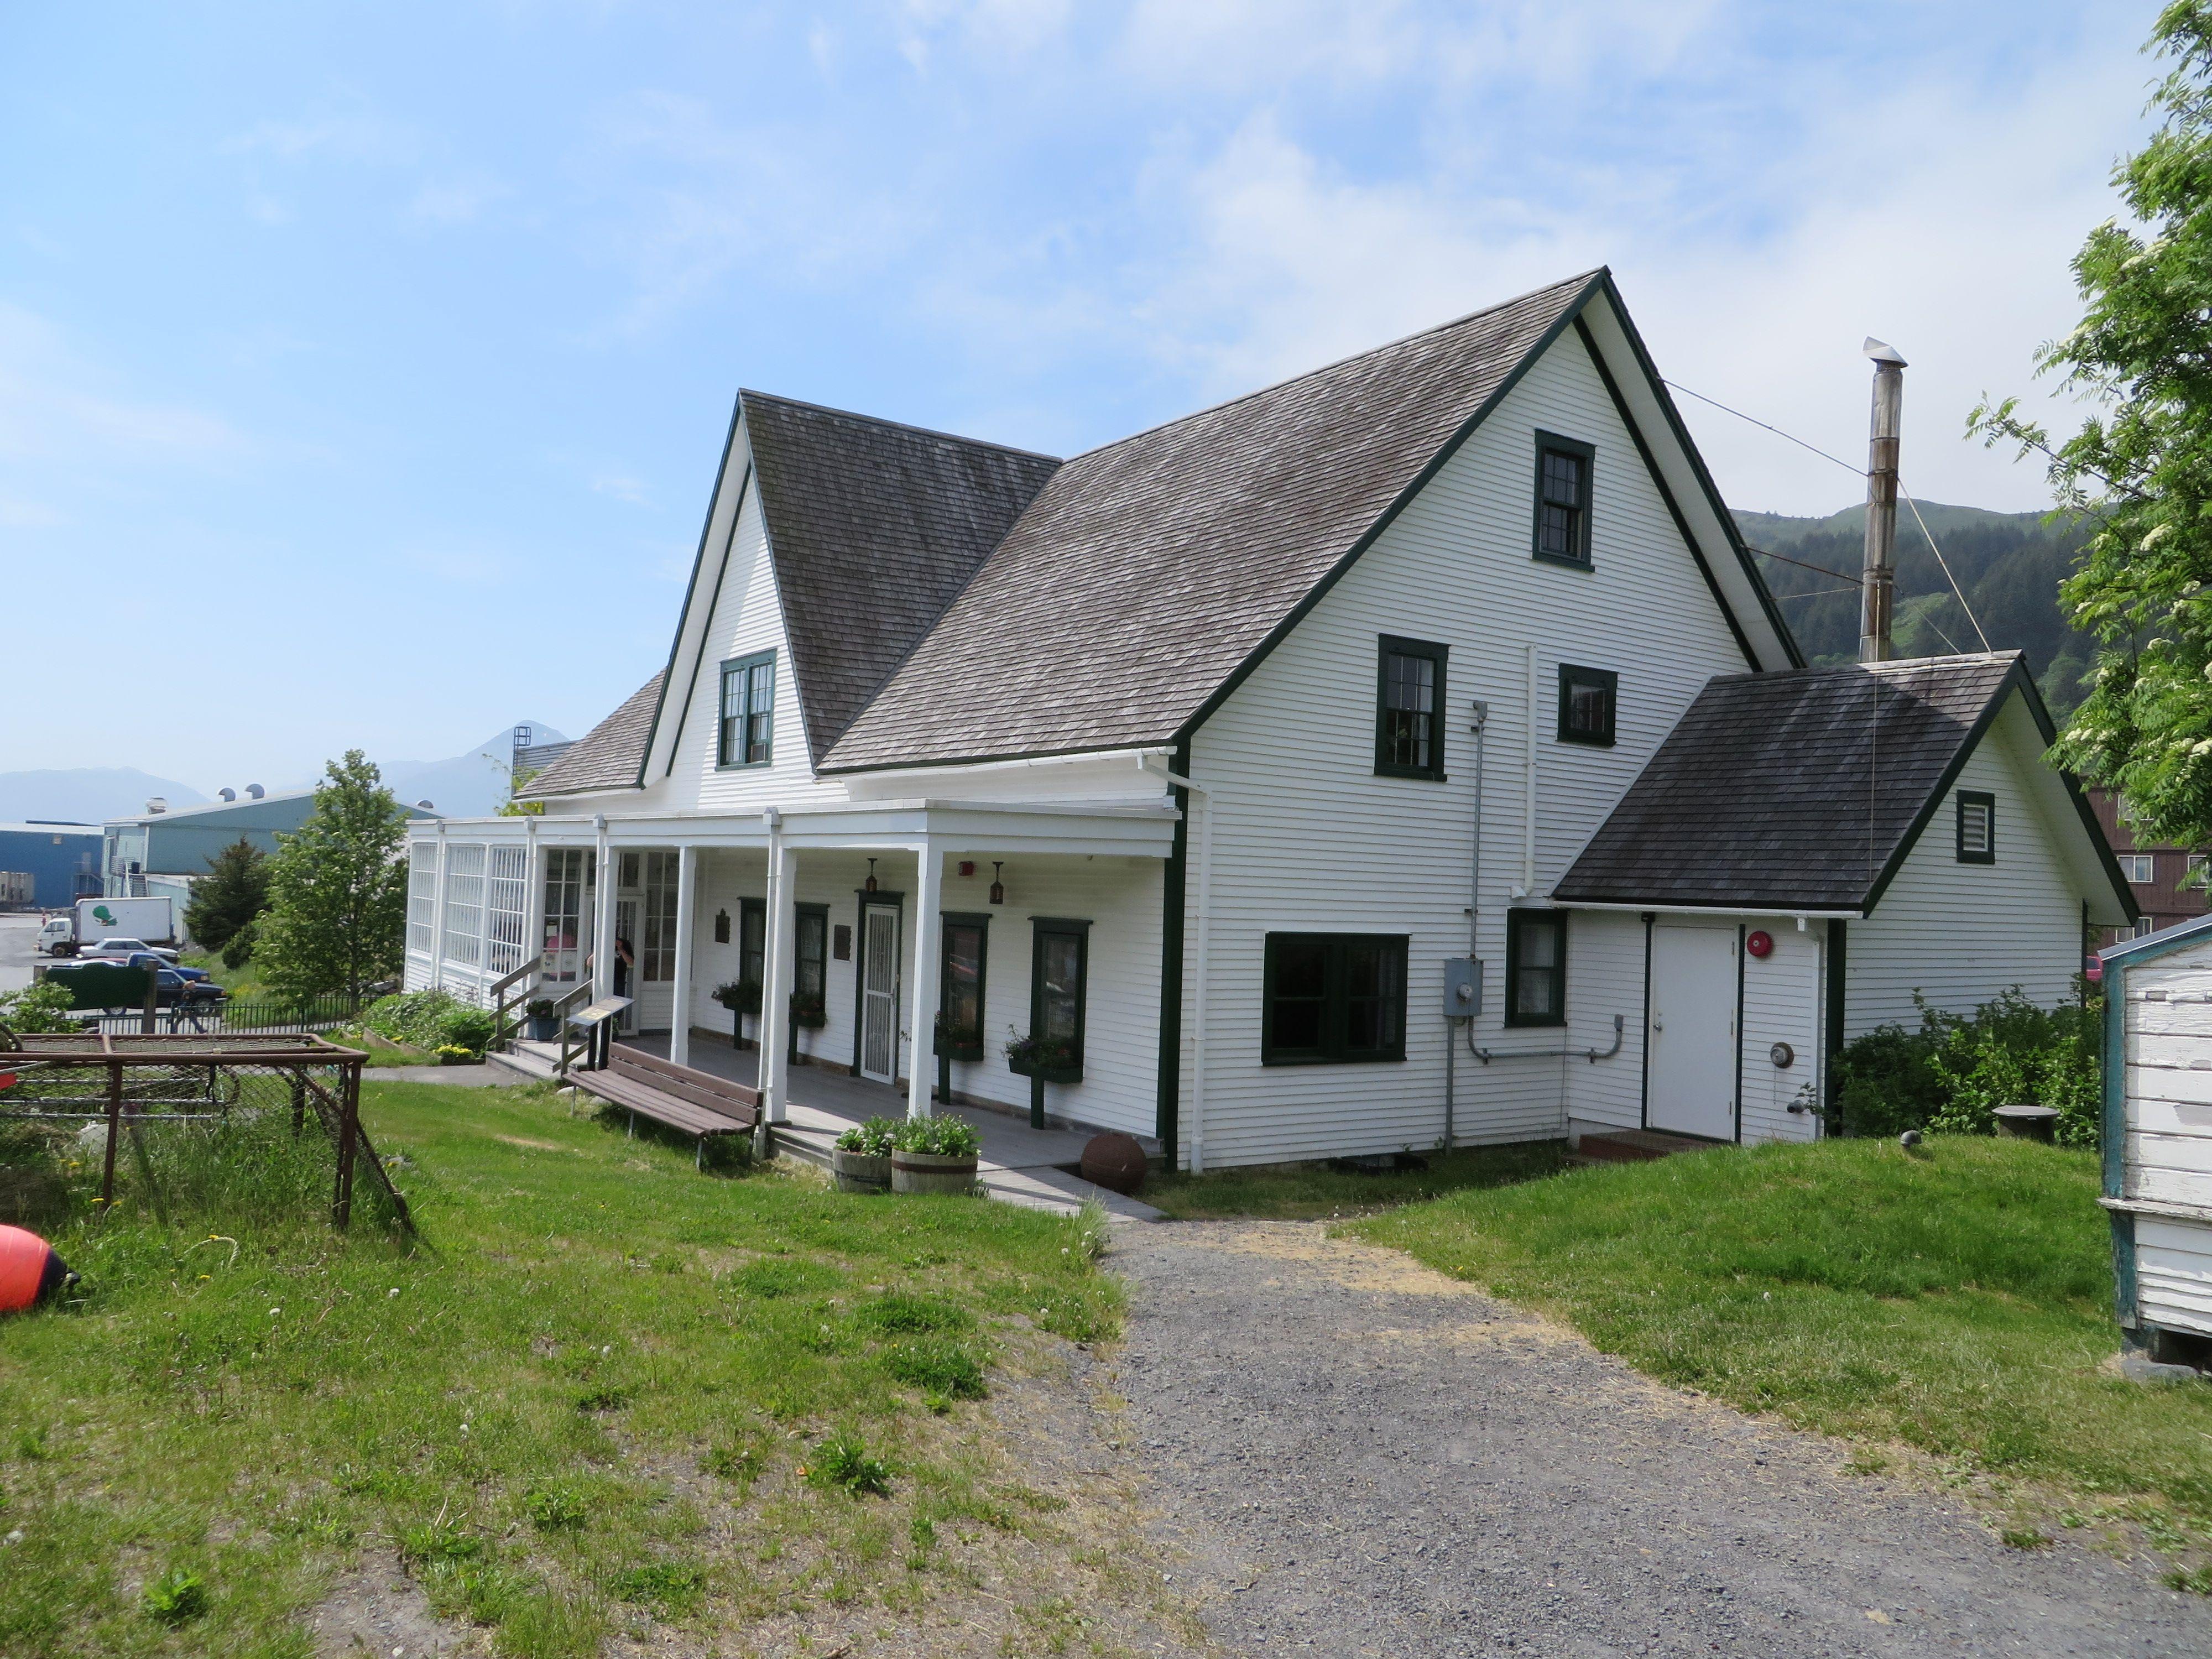 Alaska Dream Home - a54dd5e5bf95fad34be3a64e8ac222d2_Amazing Alaska Dream Home - a54dd5e5bf95fad34be3a64e8ac222d2  Image_73148.jpg